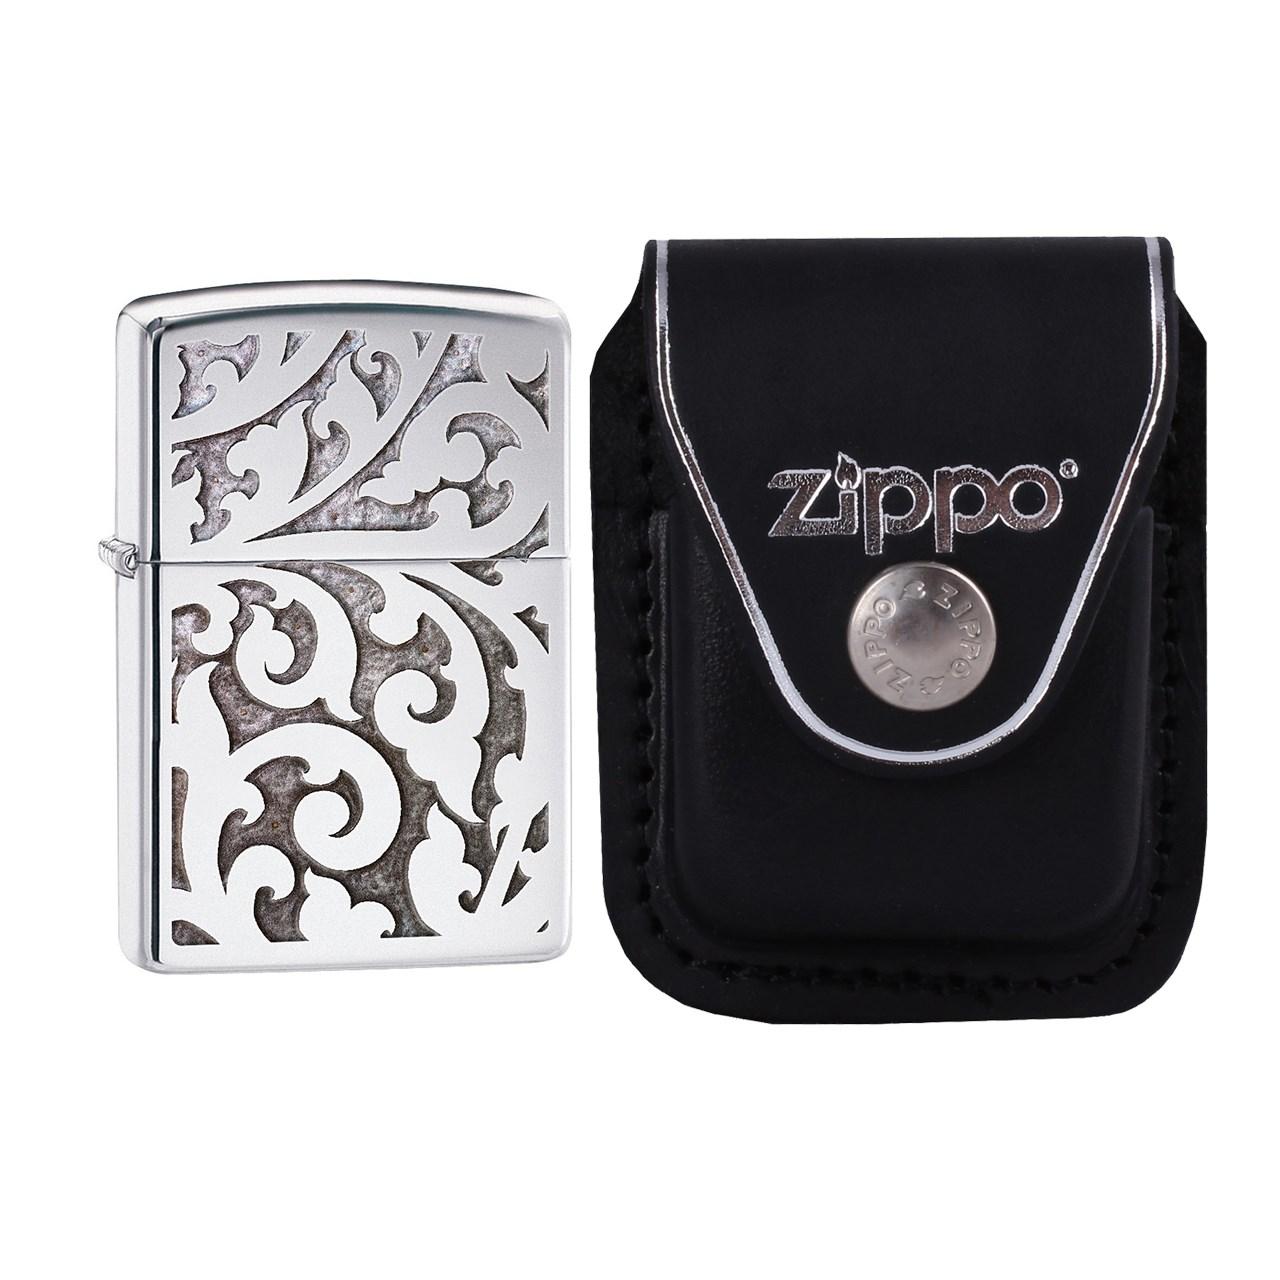 فندک زیپو کد 28530